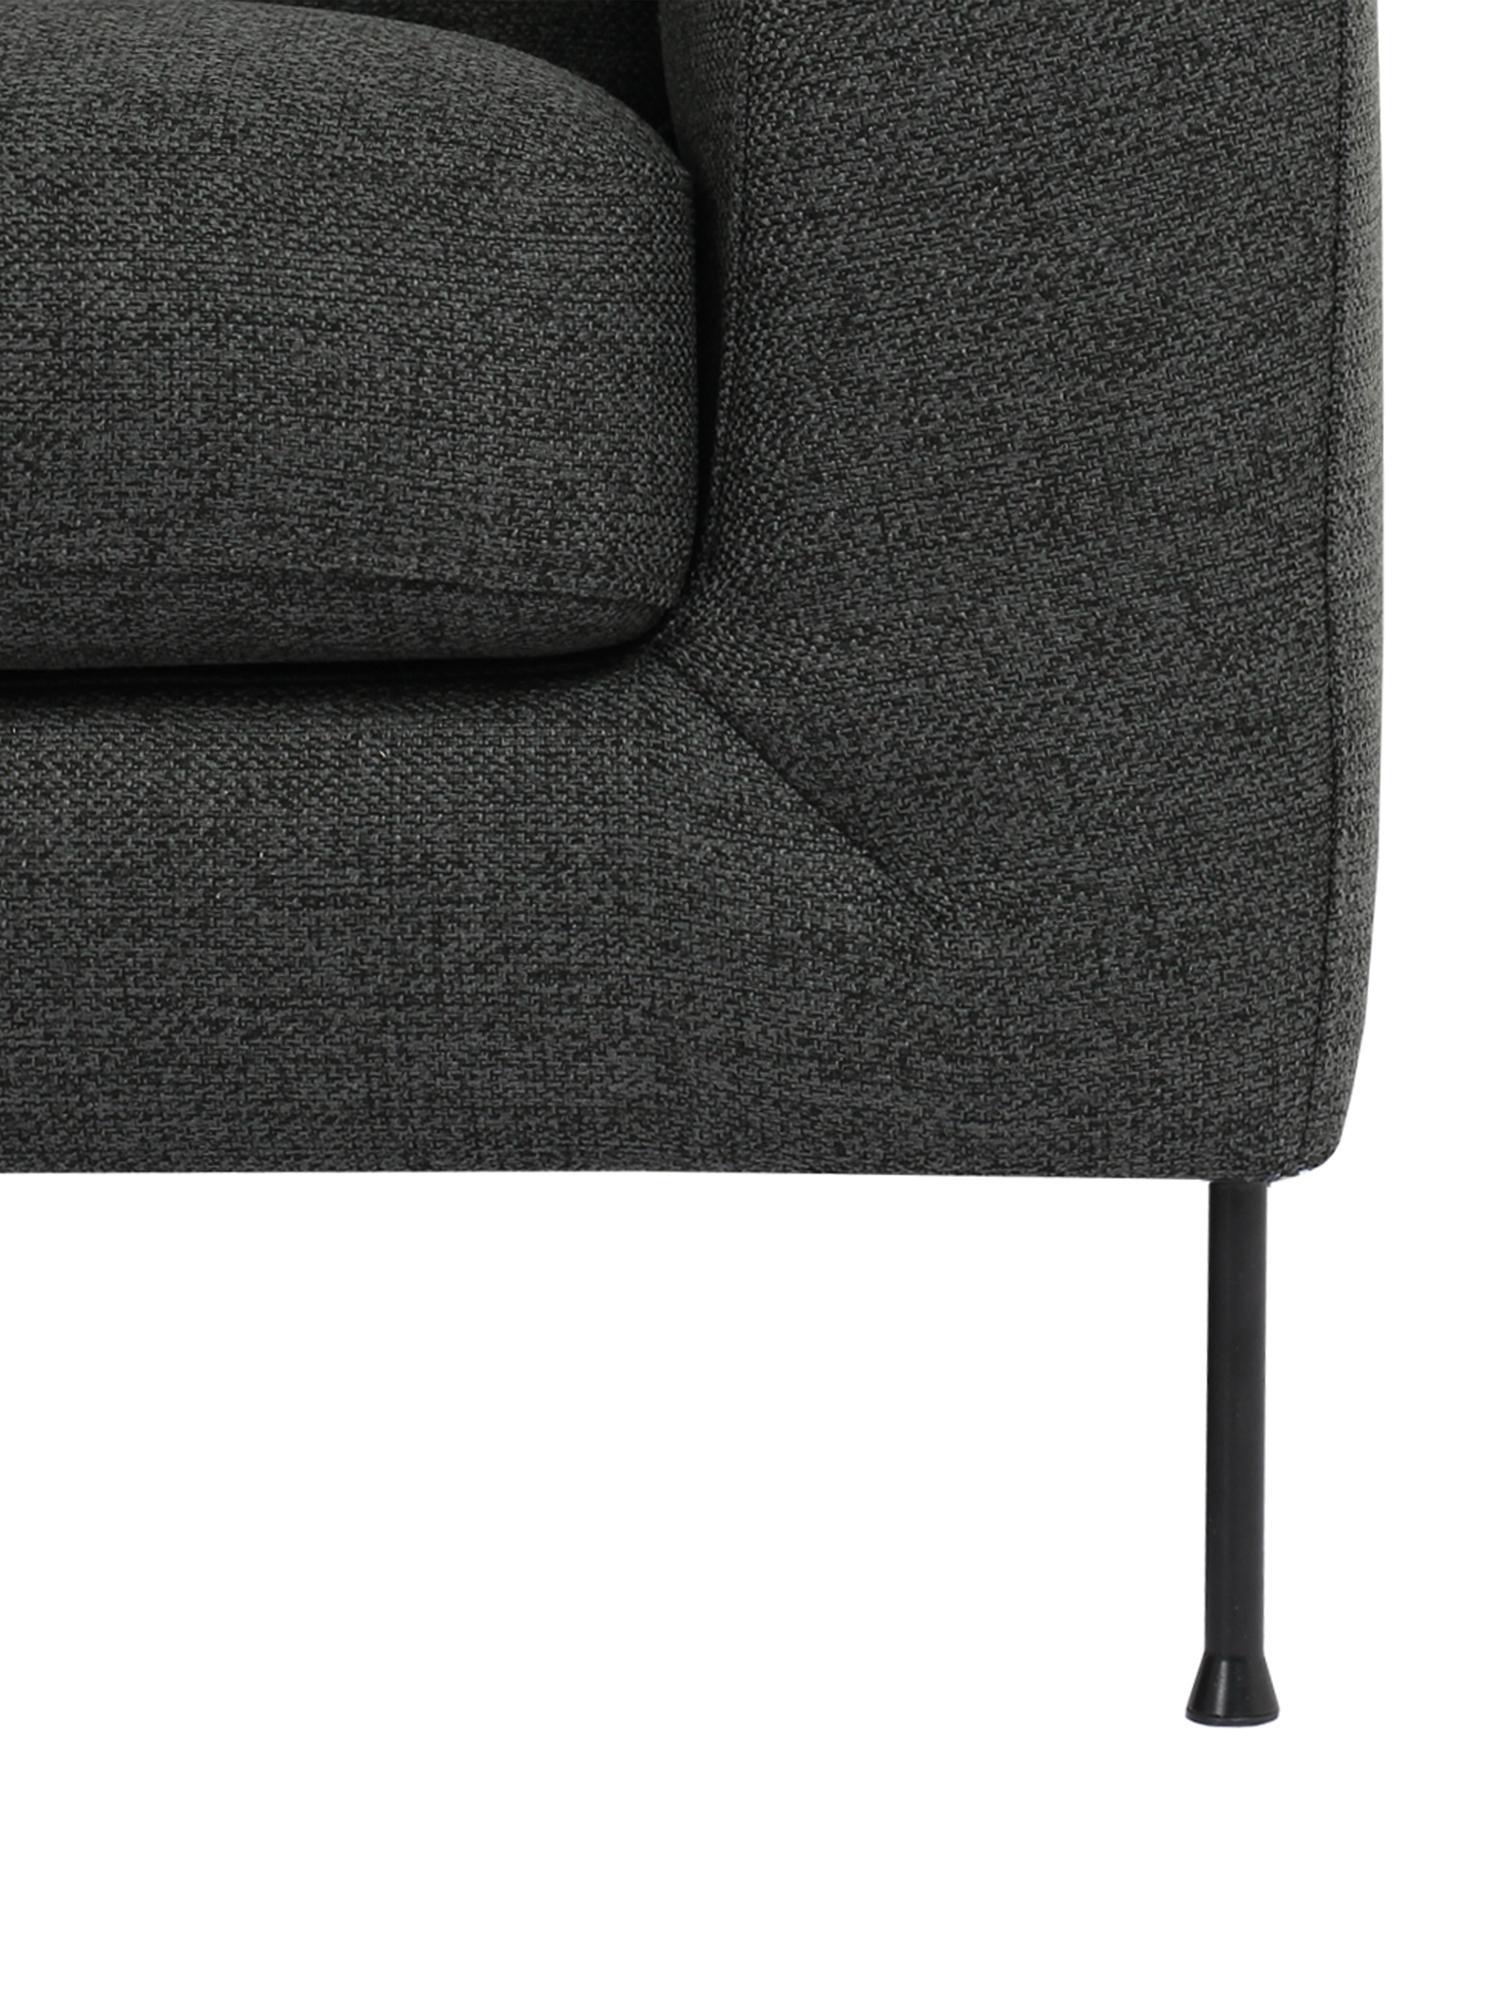 Ecksofa Cucita (3-Sitzer), Bezug: Webstoff (Polyester) Der , Gestell: Massives Kiefernholz, Füße: Metall, lackiert, Webstoff Anthrazit, B 262 x T 163 cm